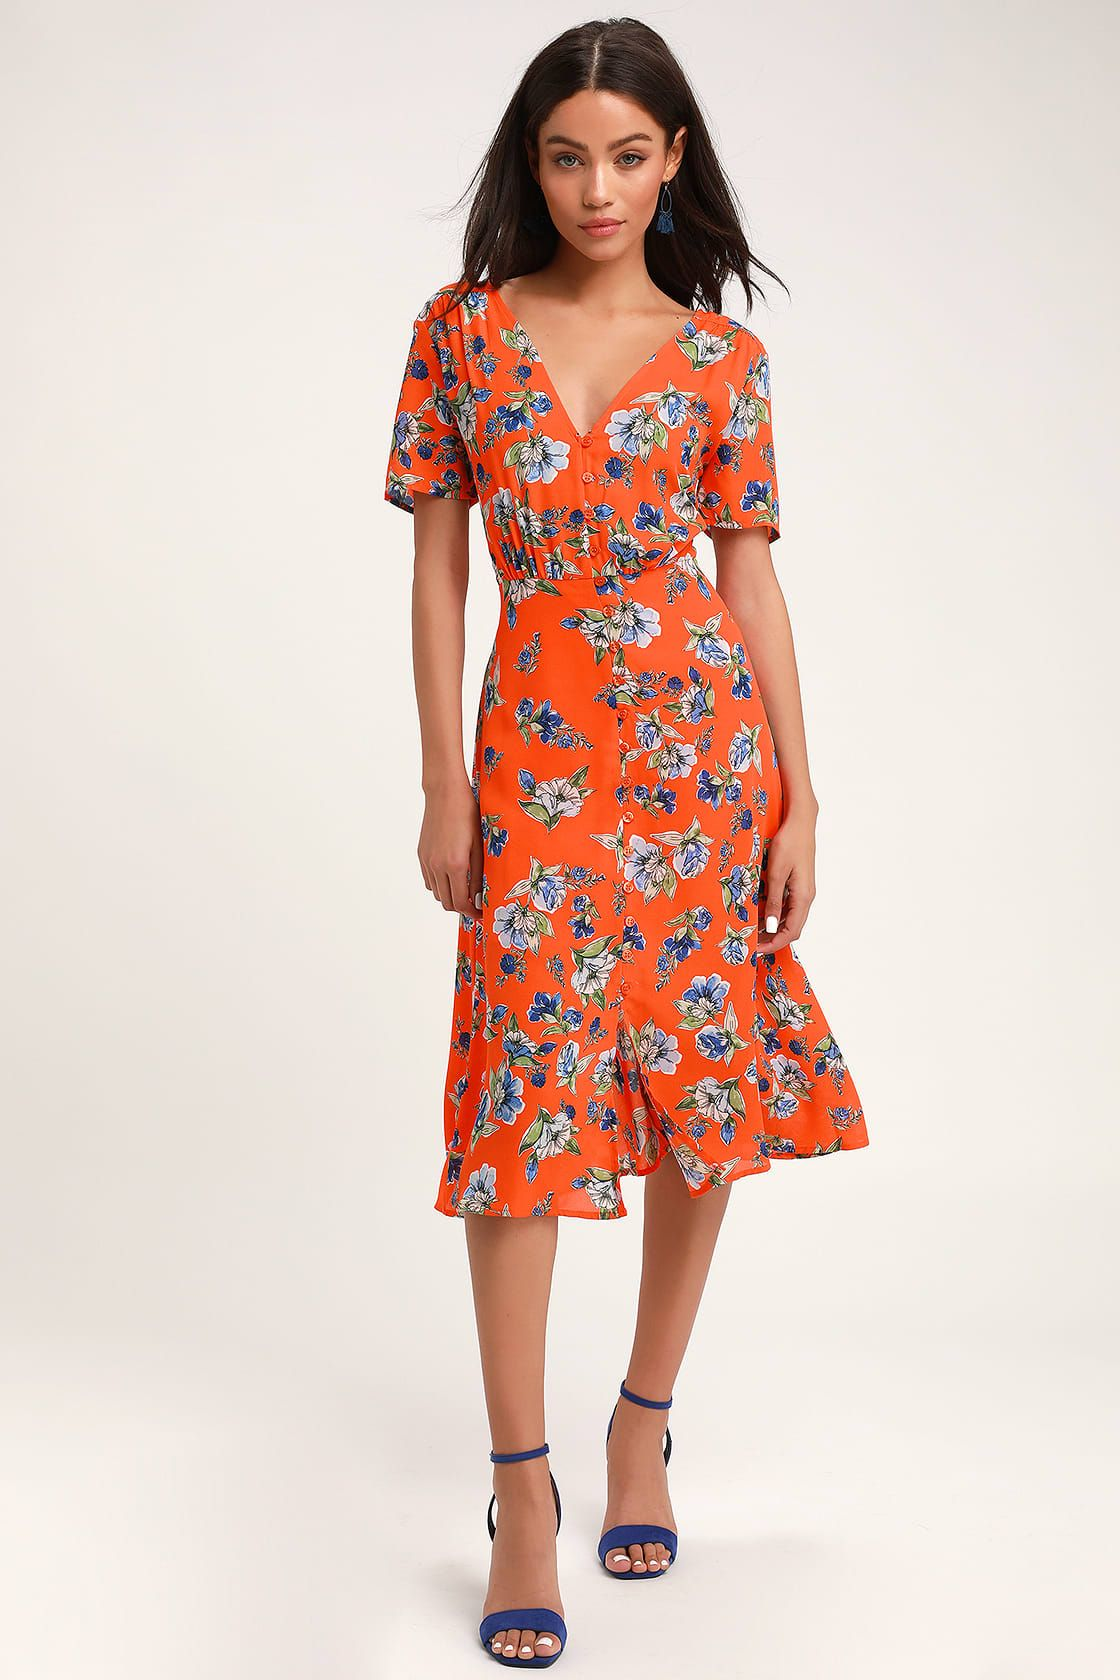 orange floral midi dress off 70% - plc.com.qa